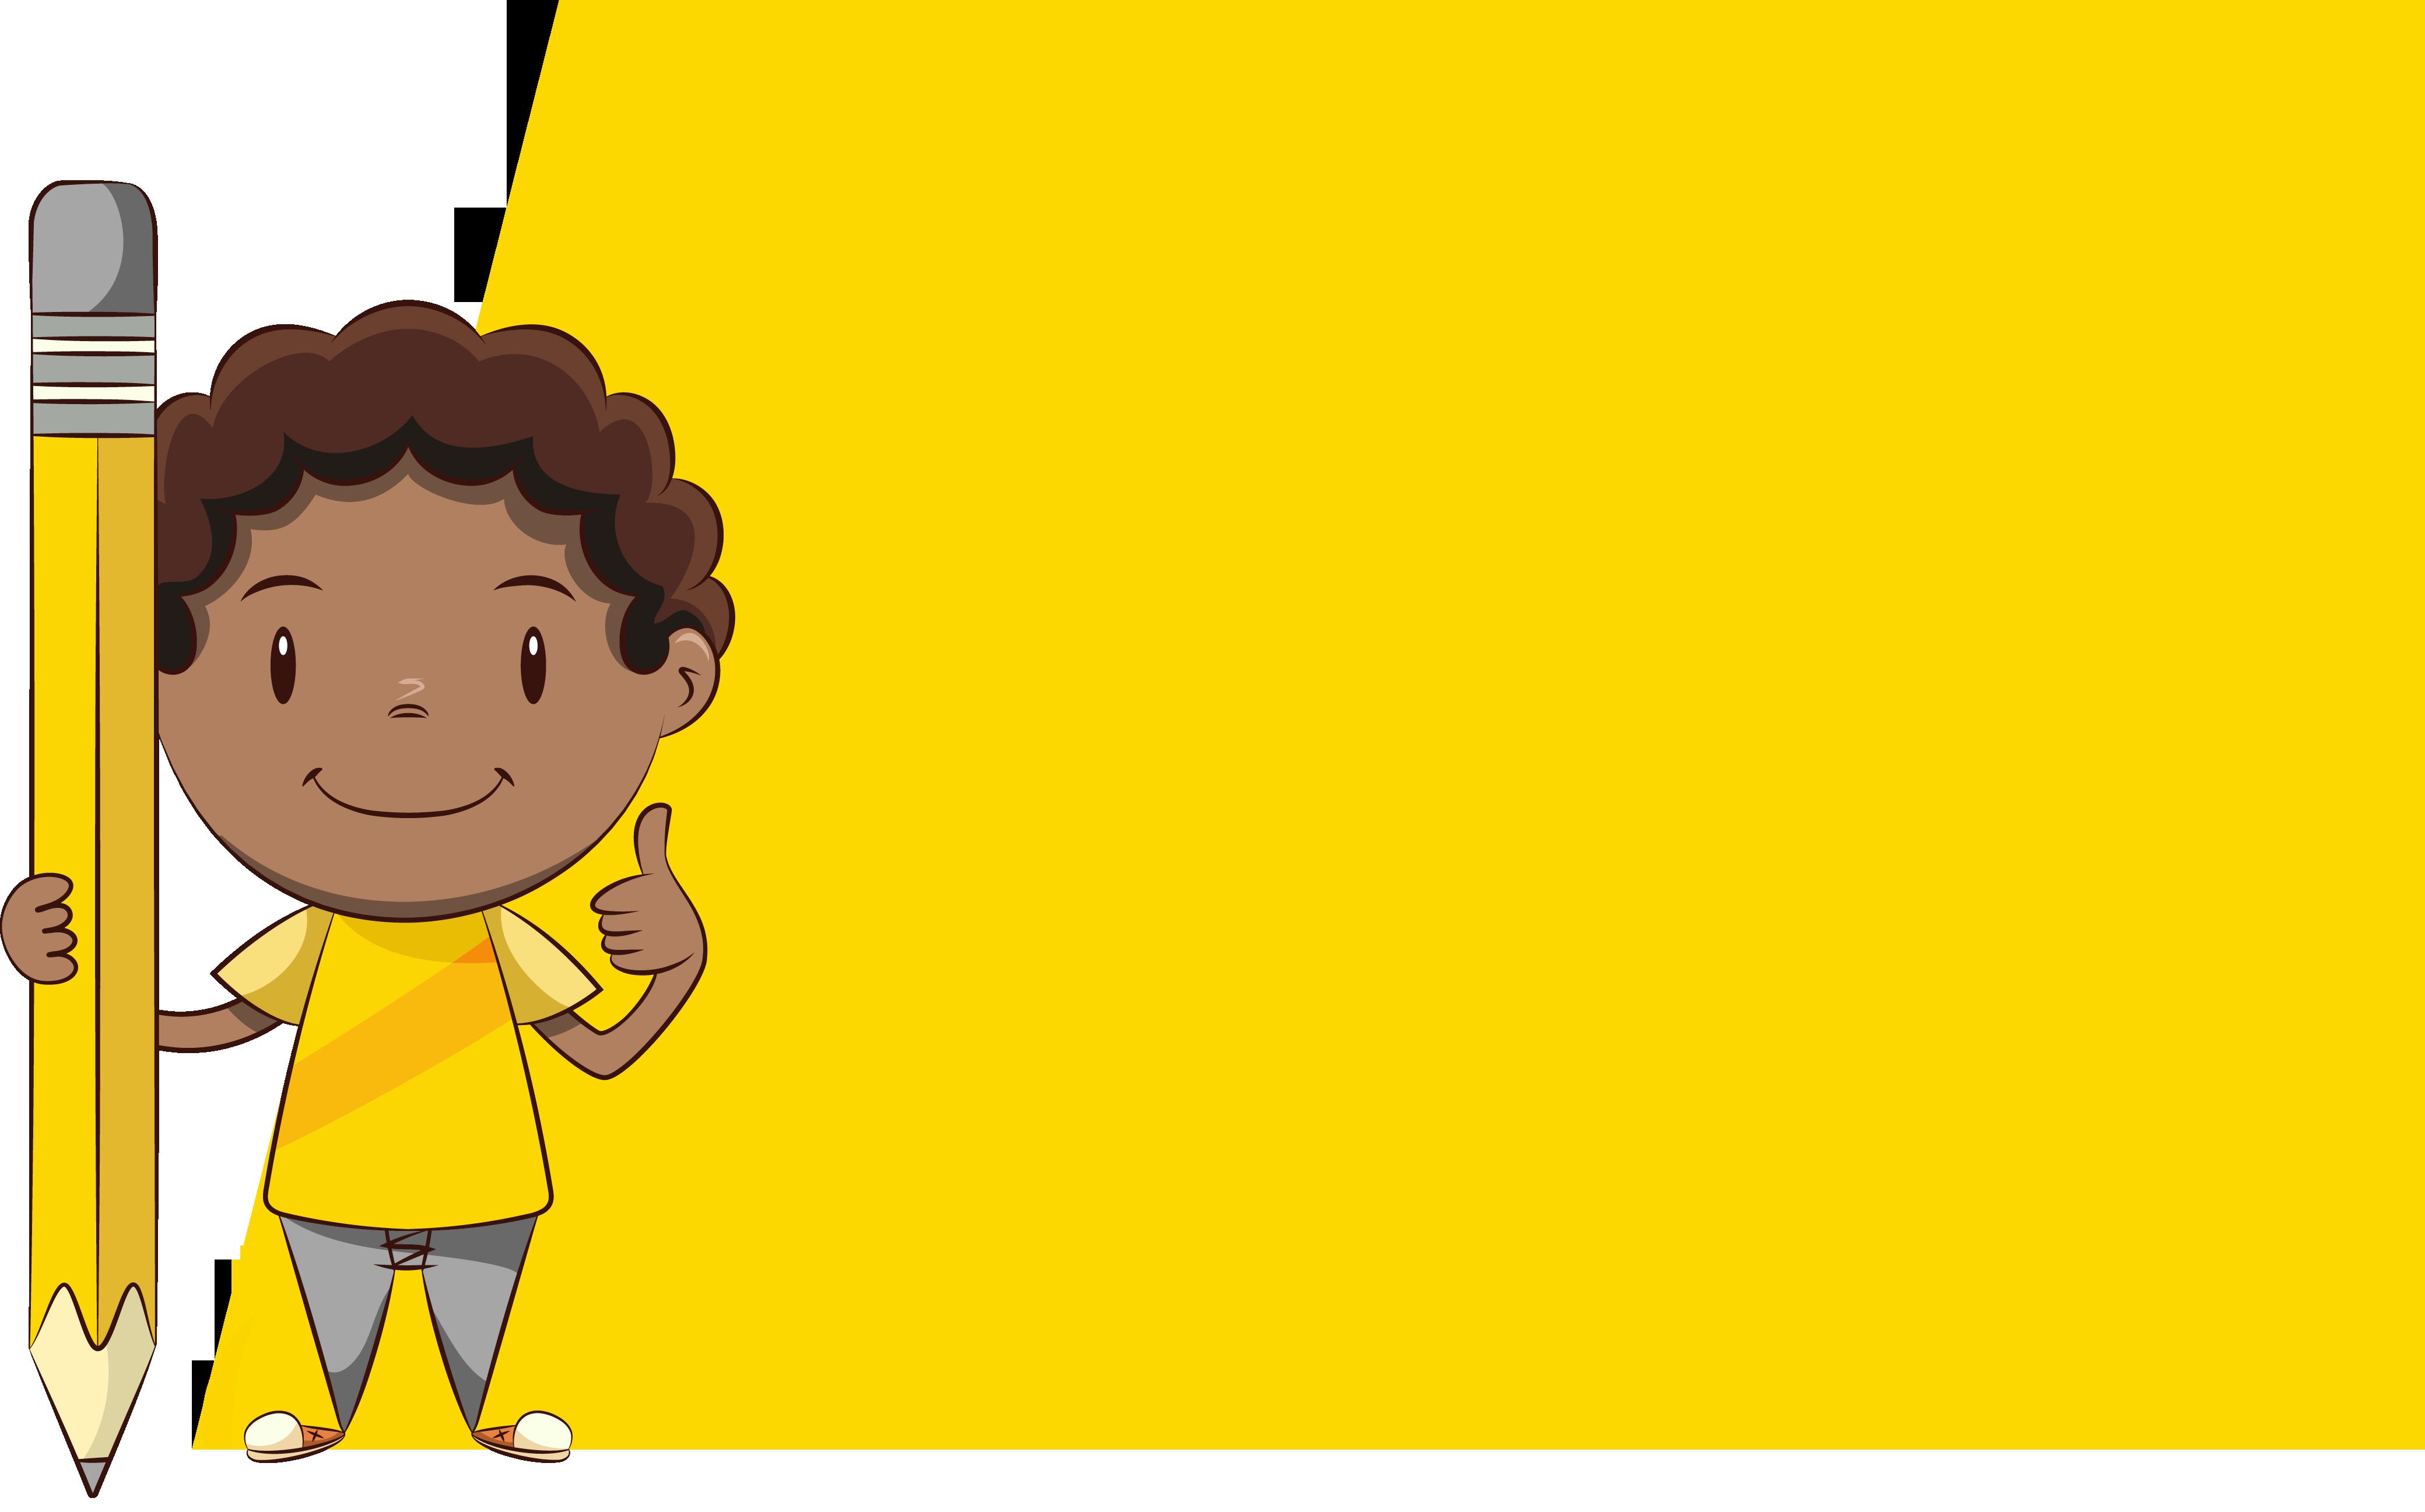 Game Pencil - Yellow Block